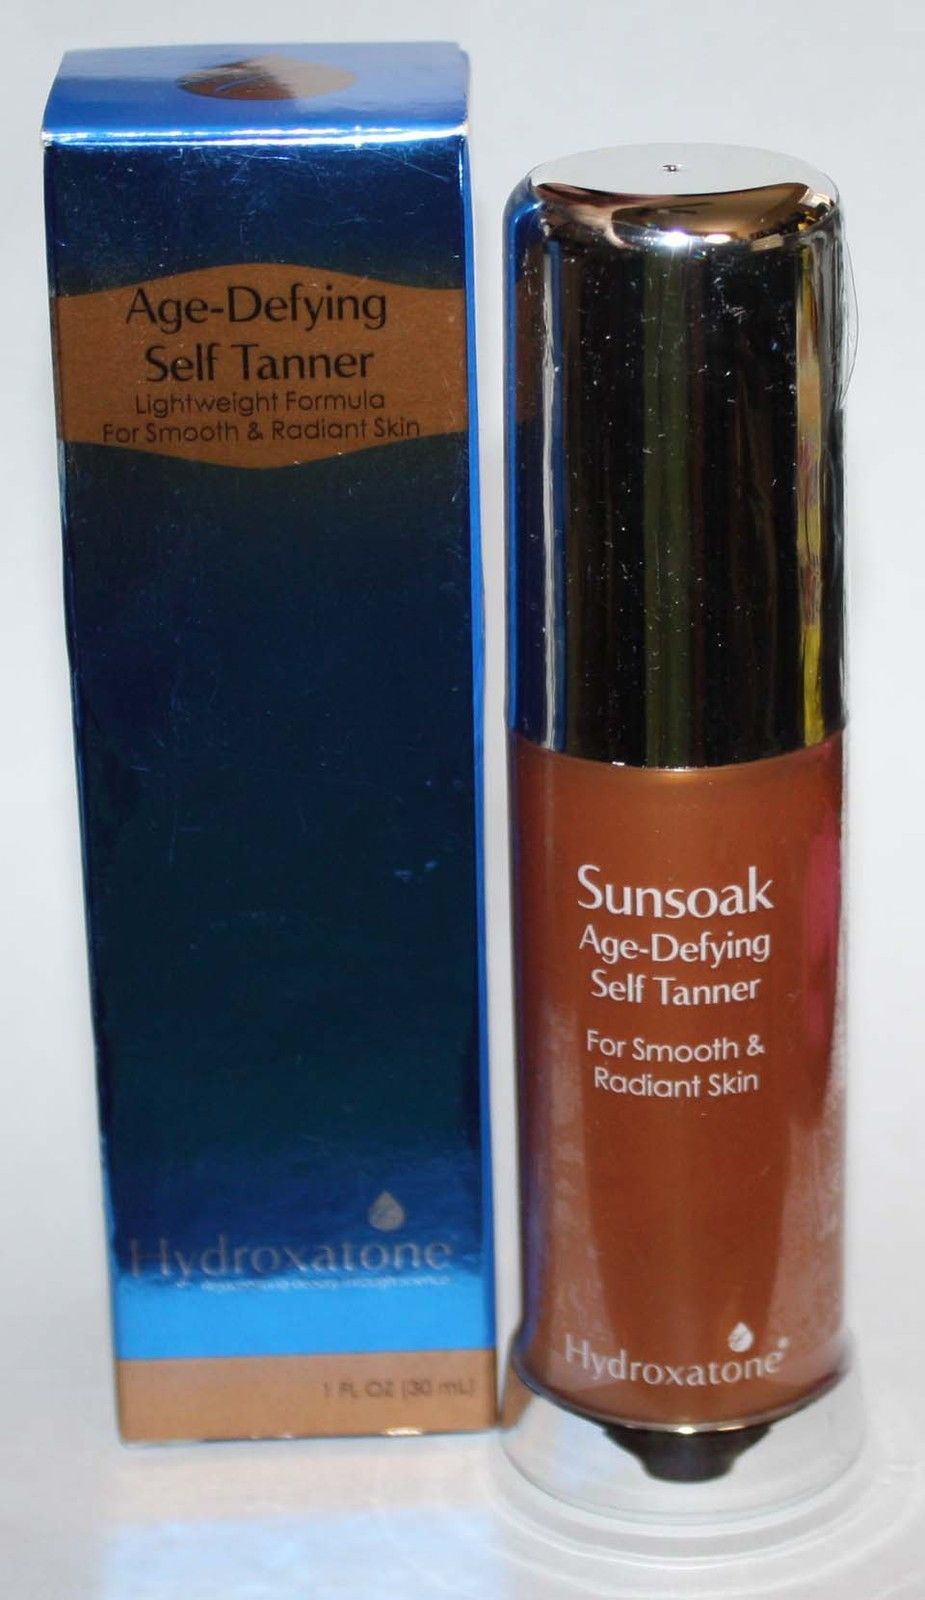 Hydroxatone Sunsoak Age-Defying Self Tanner 1 oz *Reduced* 10306